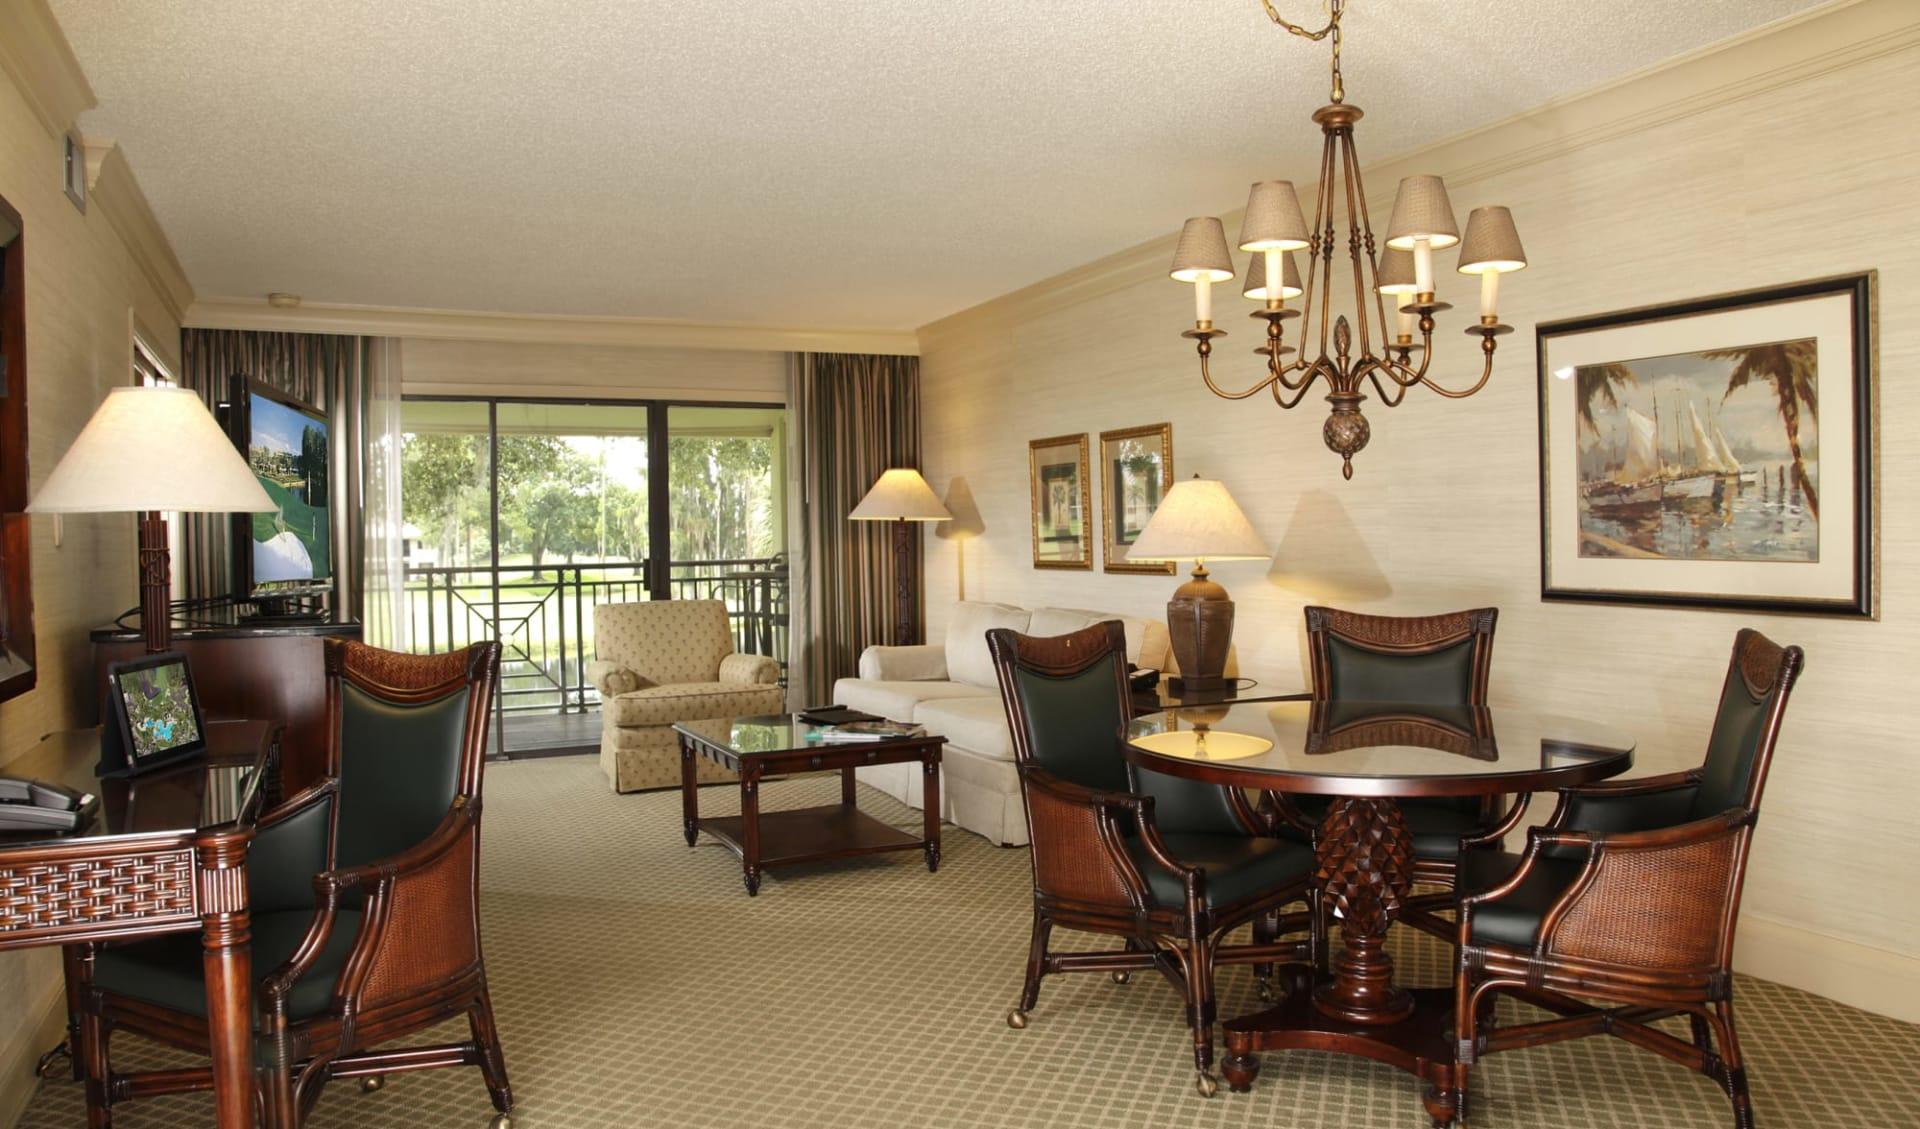 Saddlebrook Resort in Tampa:  Salamander Spa & Golf Resort Innsibrook - Wohnzimmer des Doppelzimmers